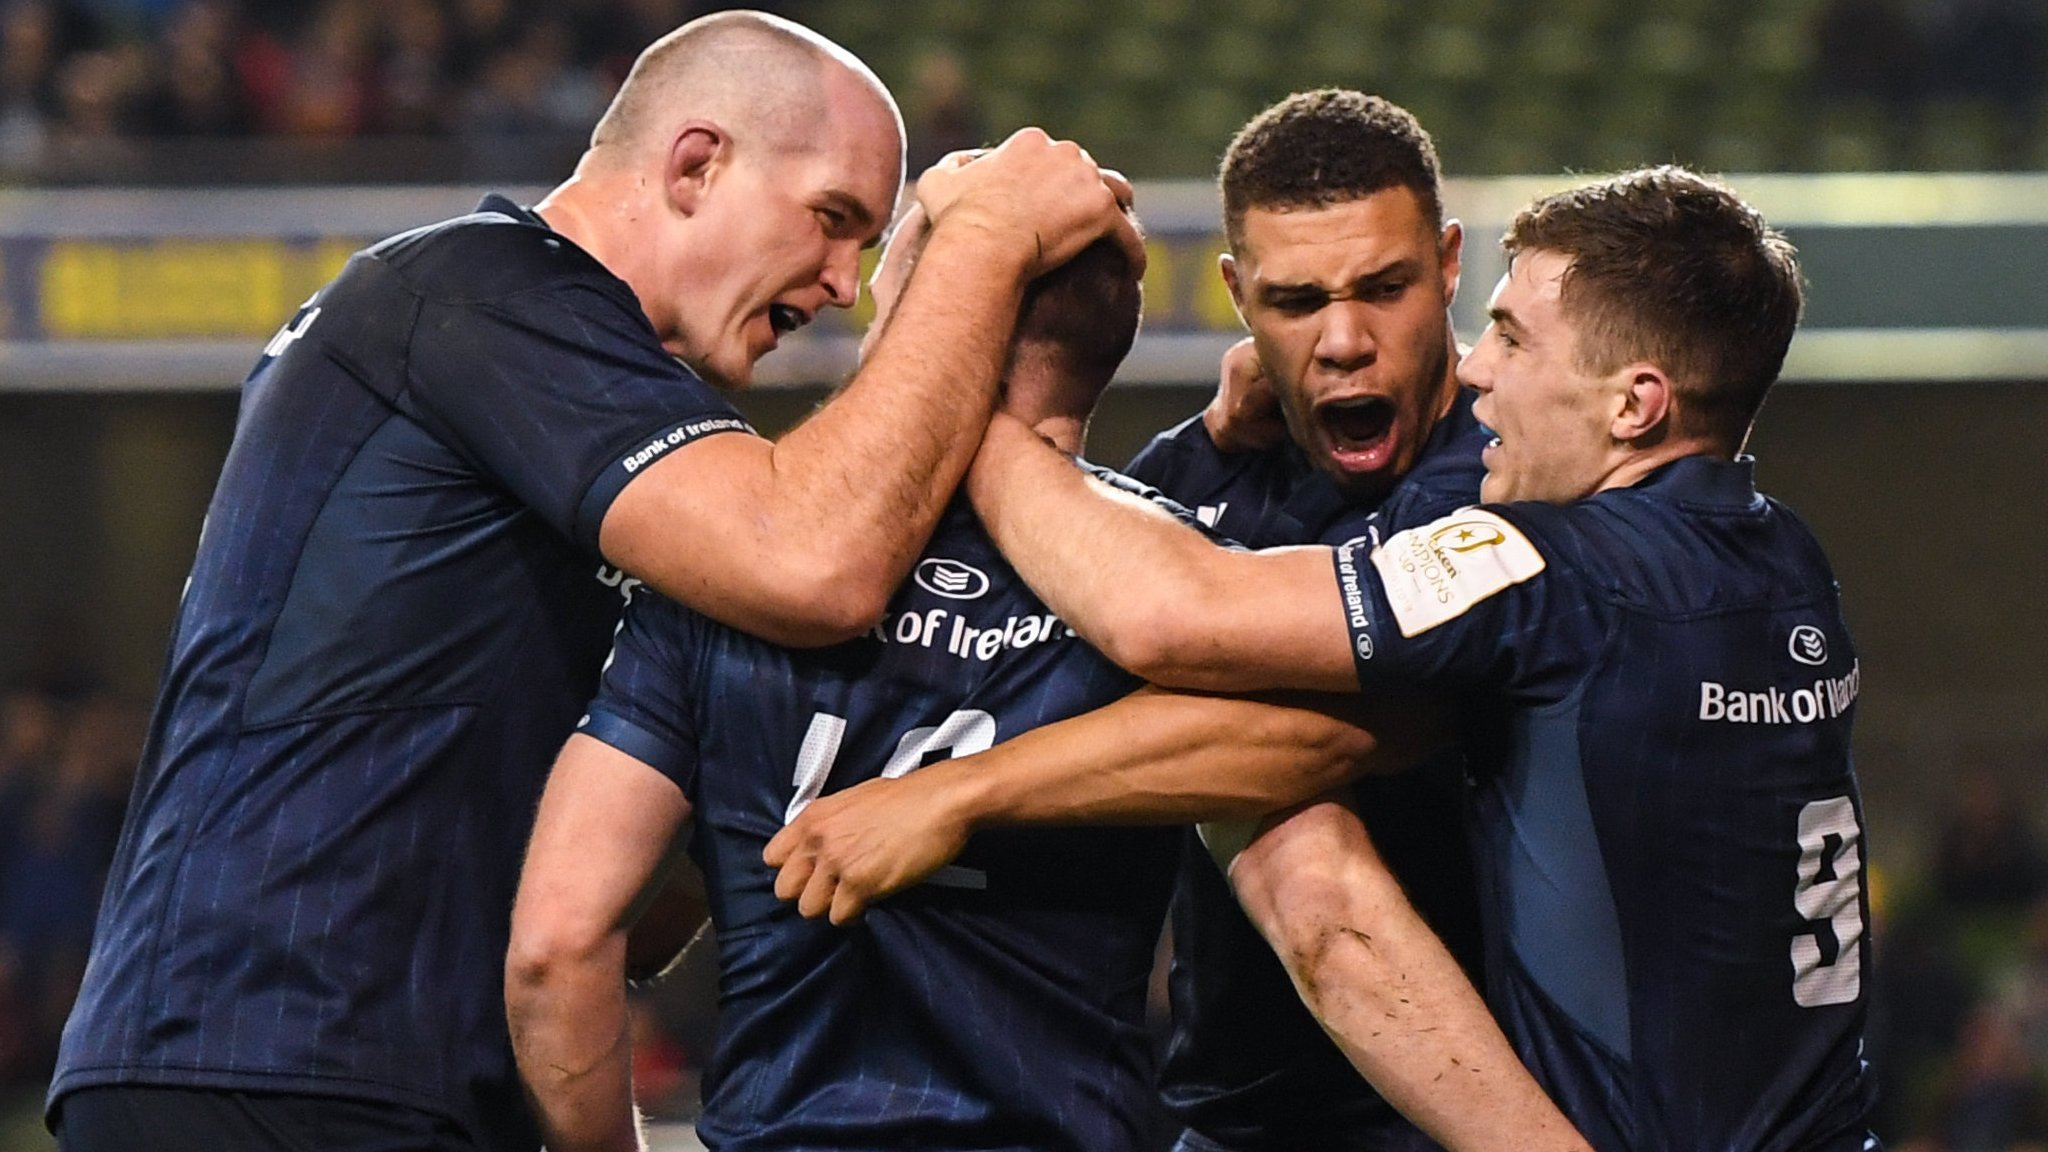 European Rugby Champions Cup: Leinster 42-15 Bath